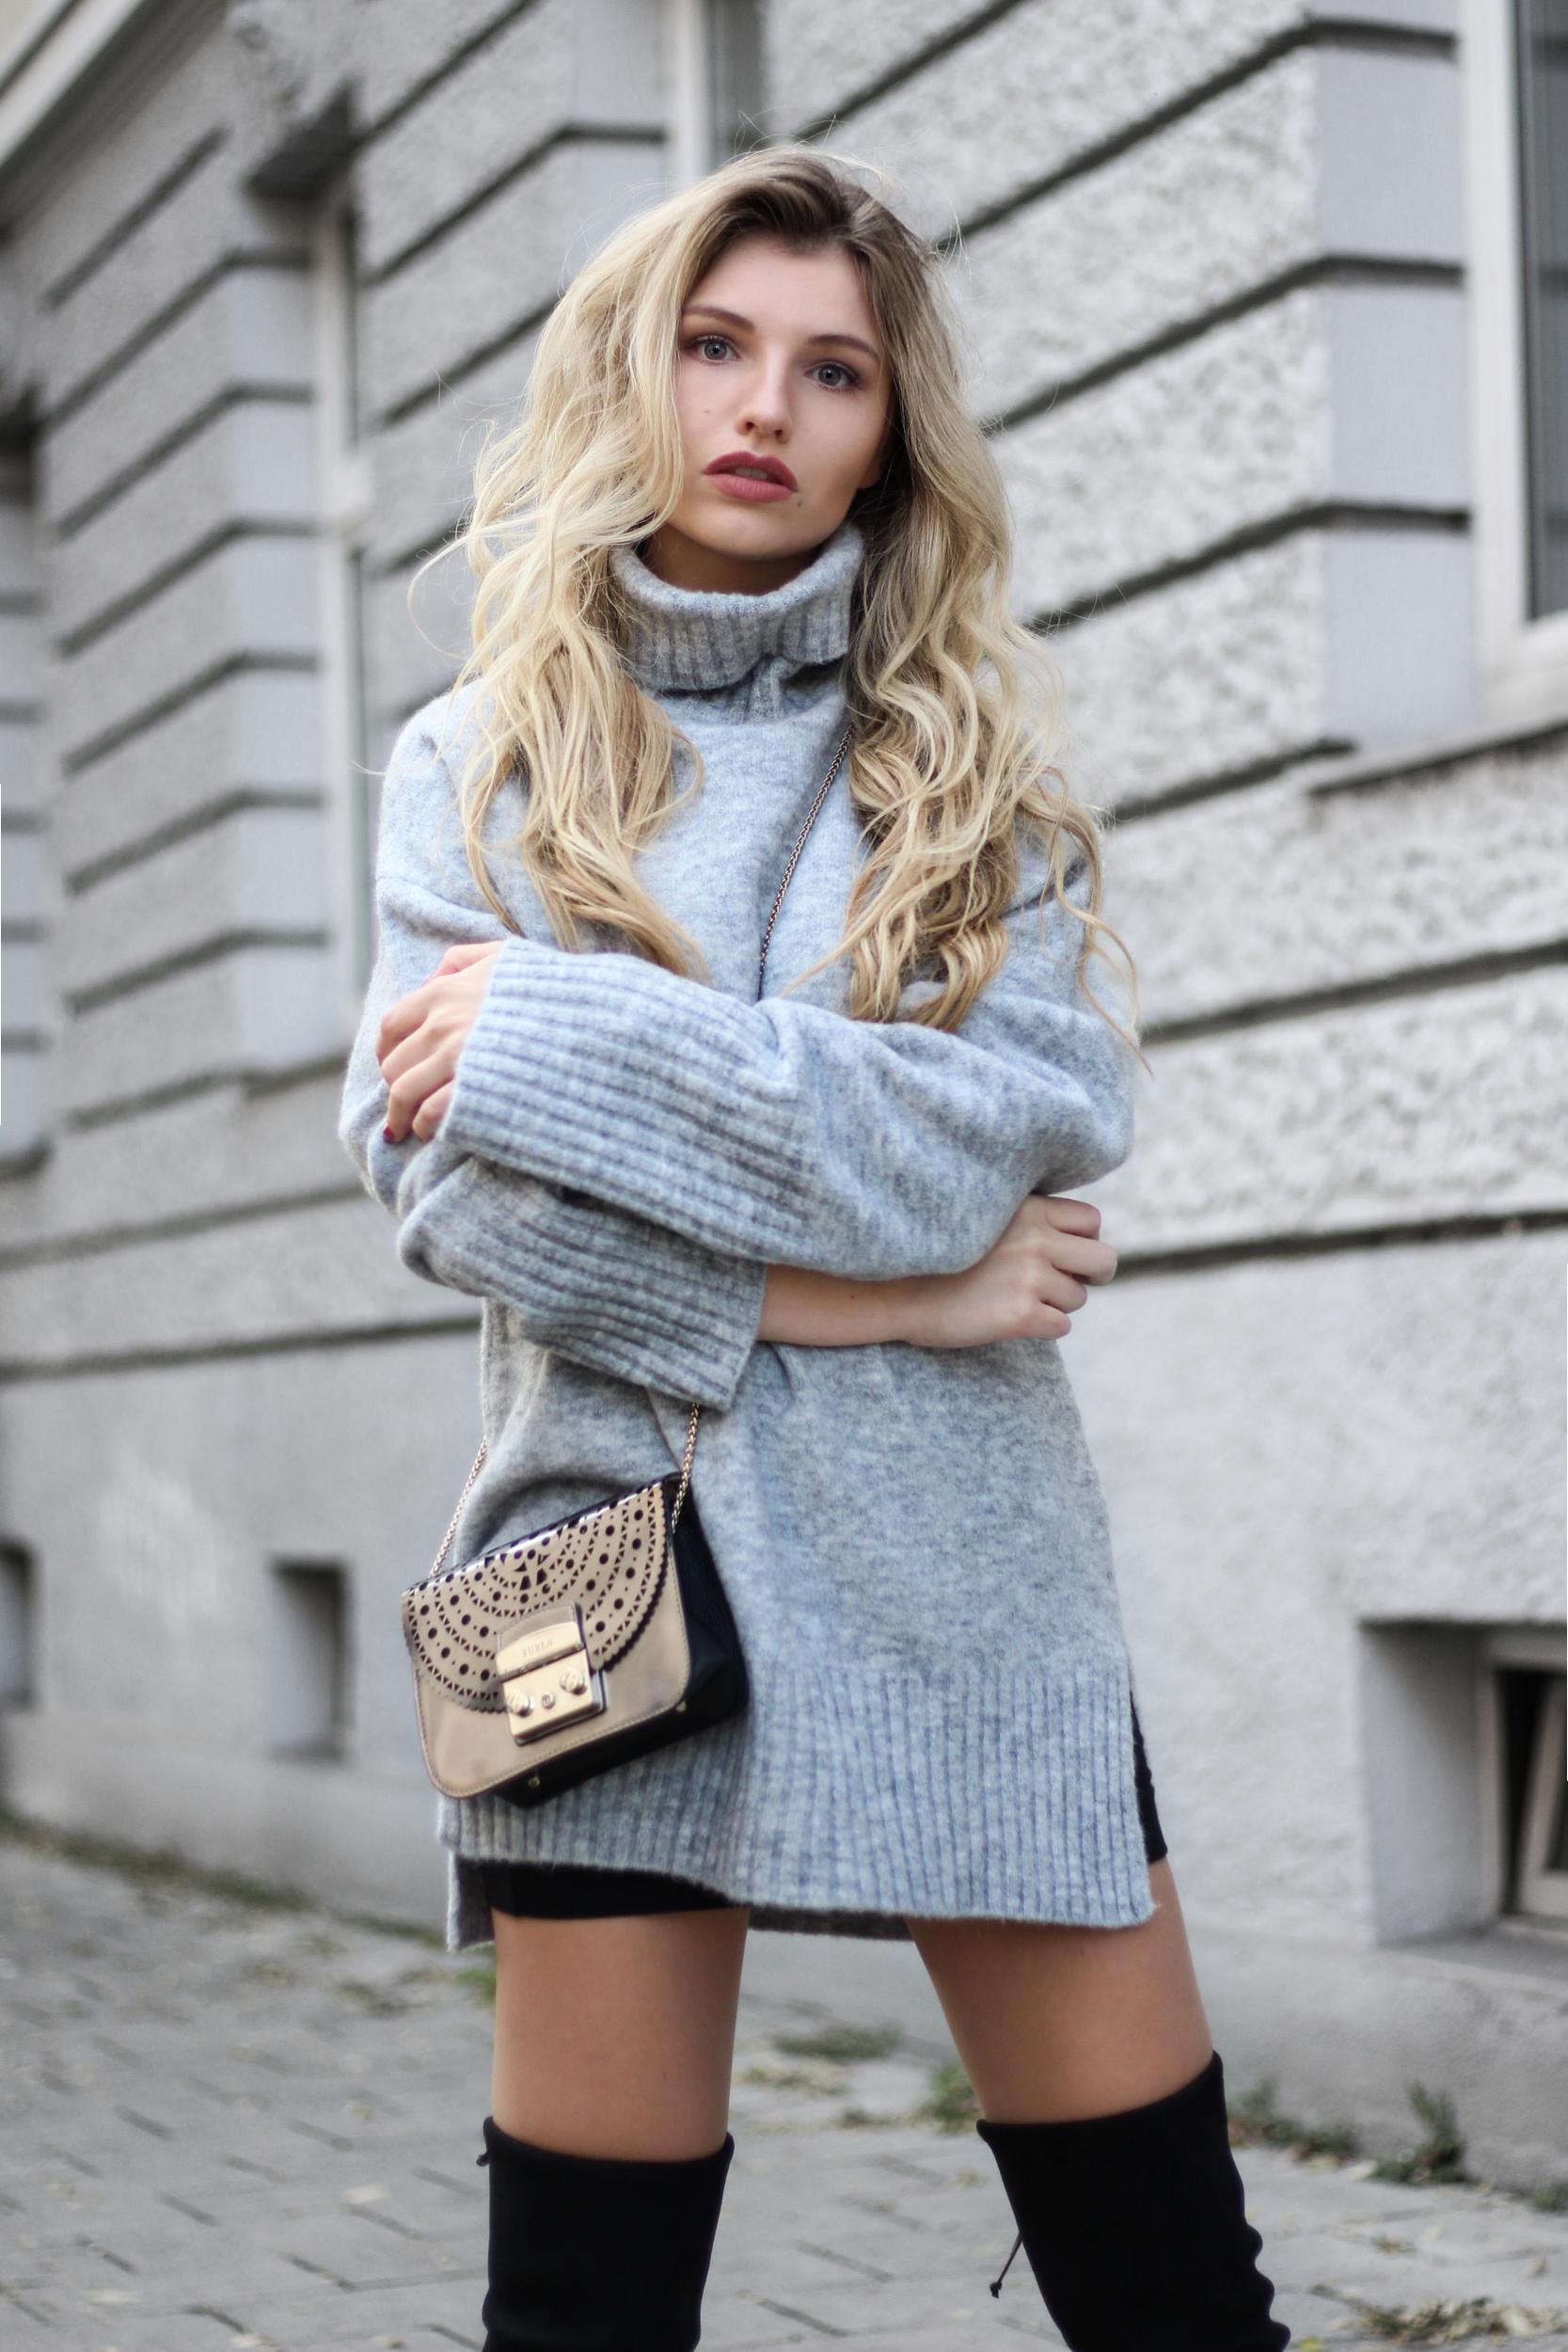 franziska-elea-blogger-aus-muenchen-about-you-overknee-stiefel-oversize-pullover-overknees-kombinieren-winterstiefel-fall-outfit-look-autumn-winter-2016